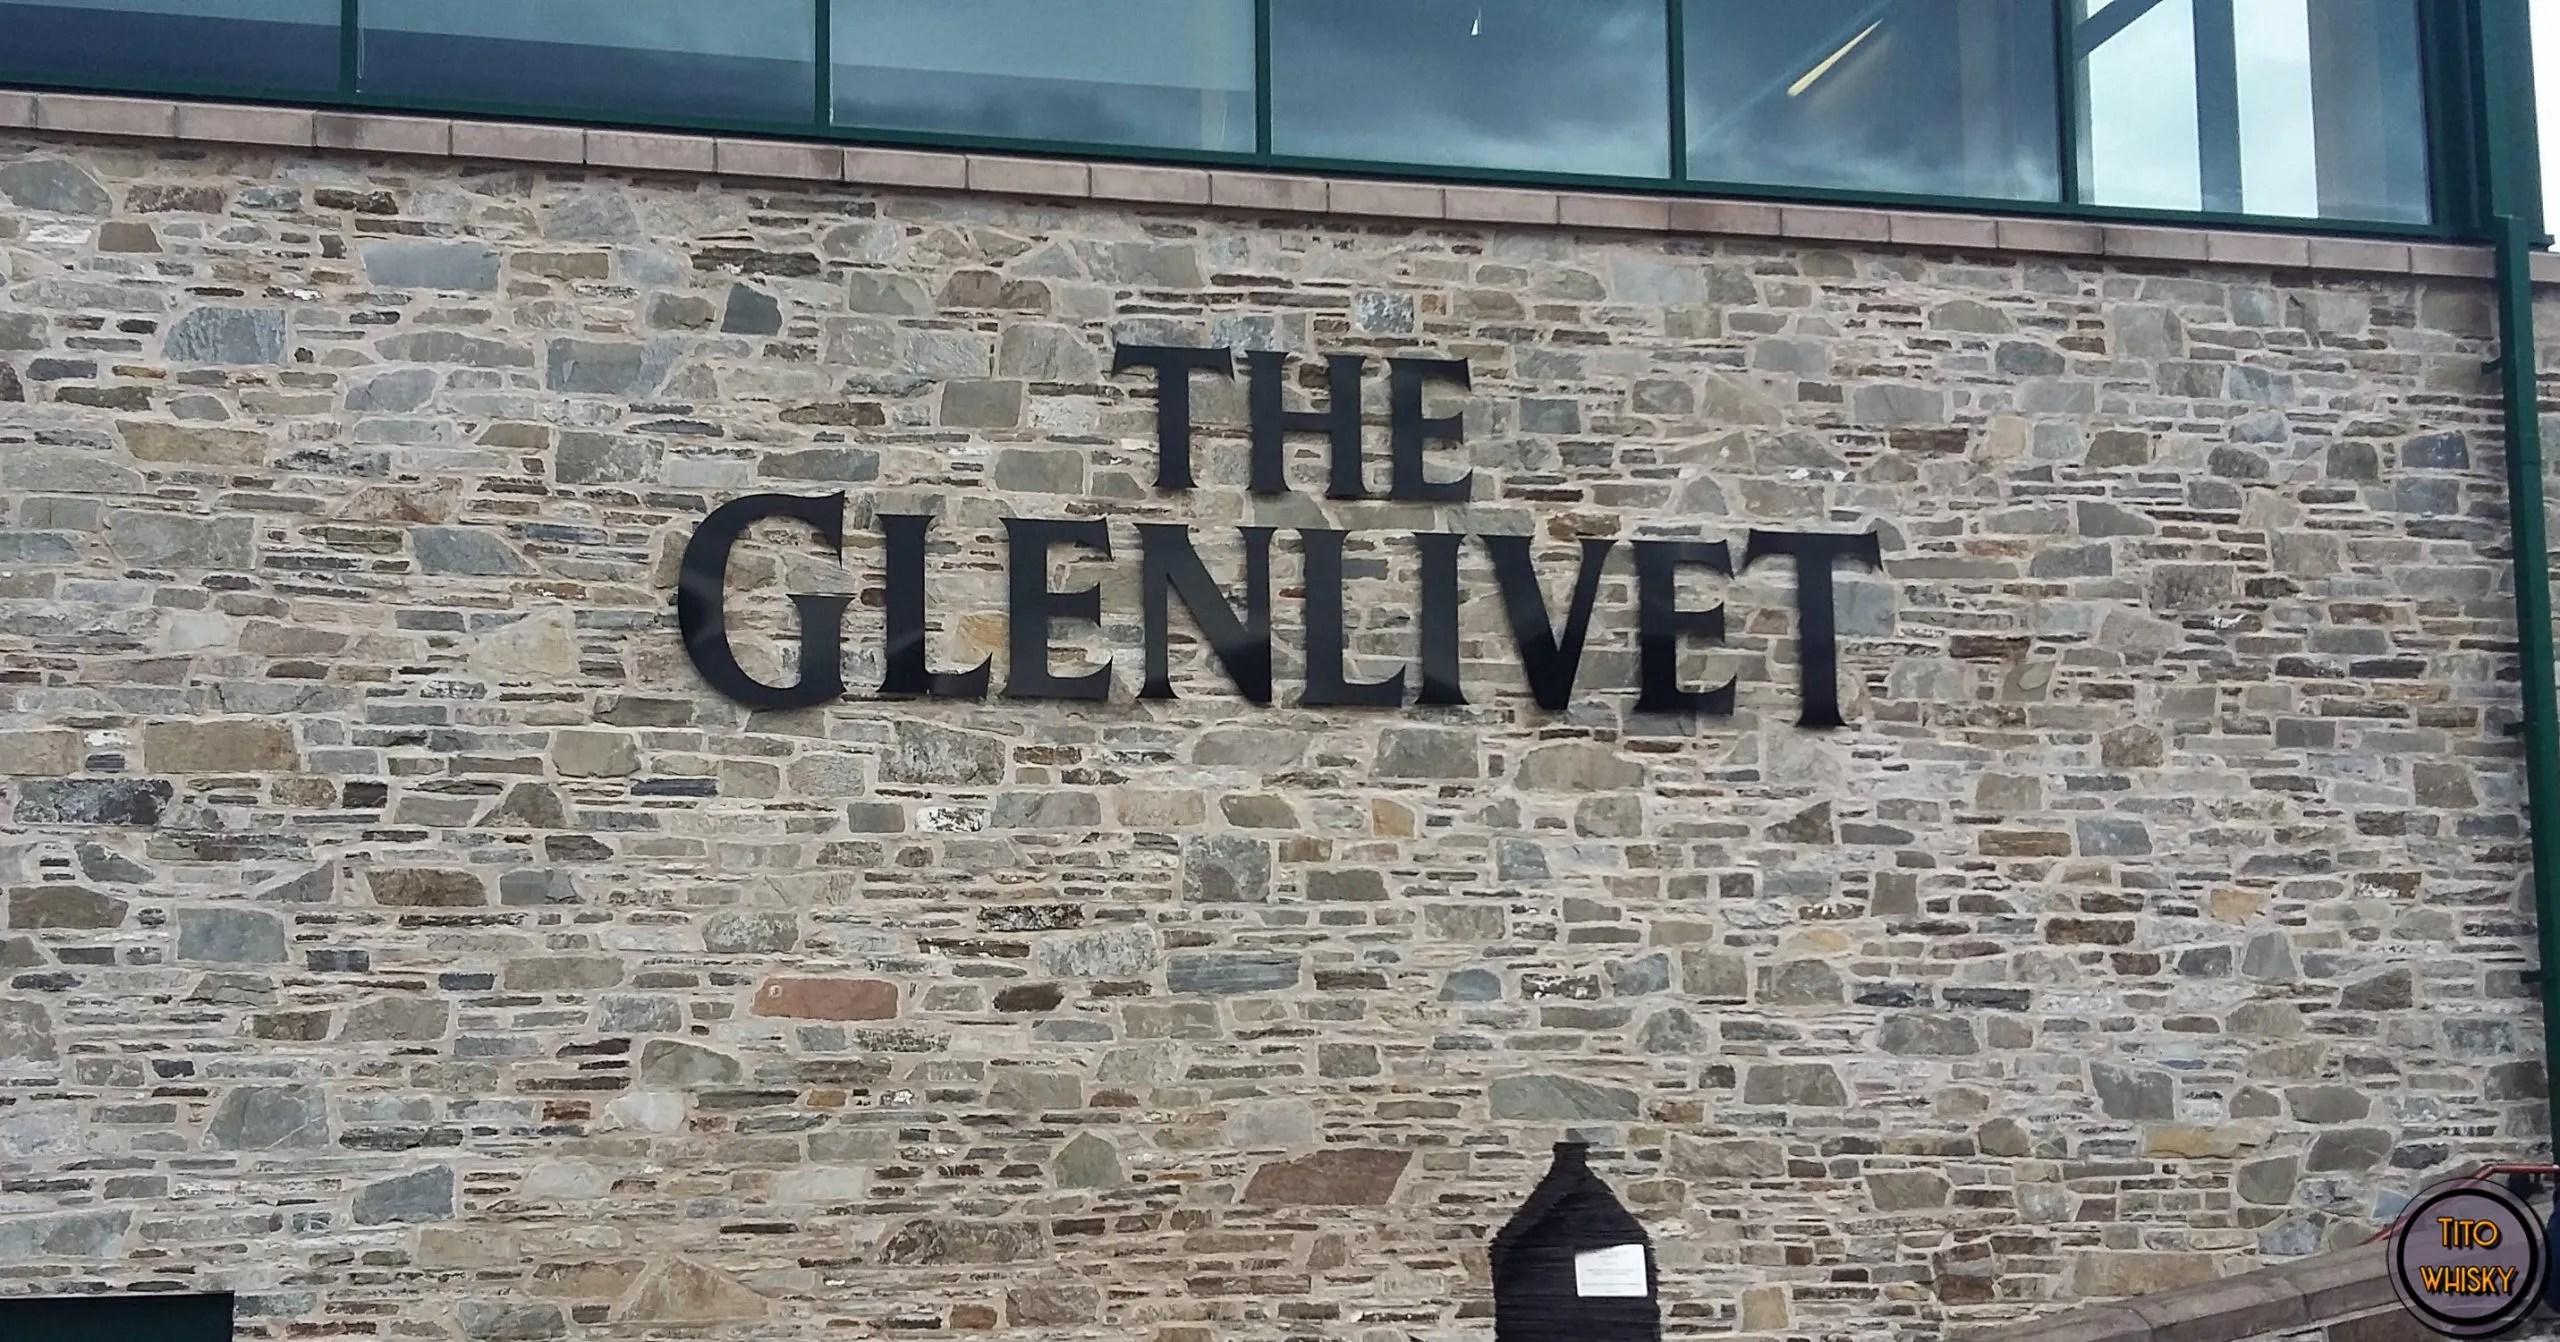 Destilería The Glenlivet